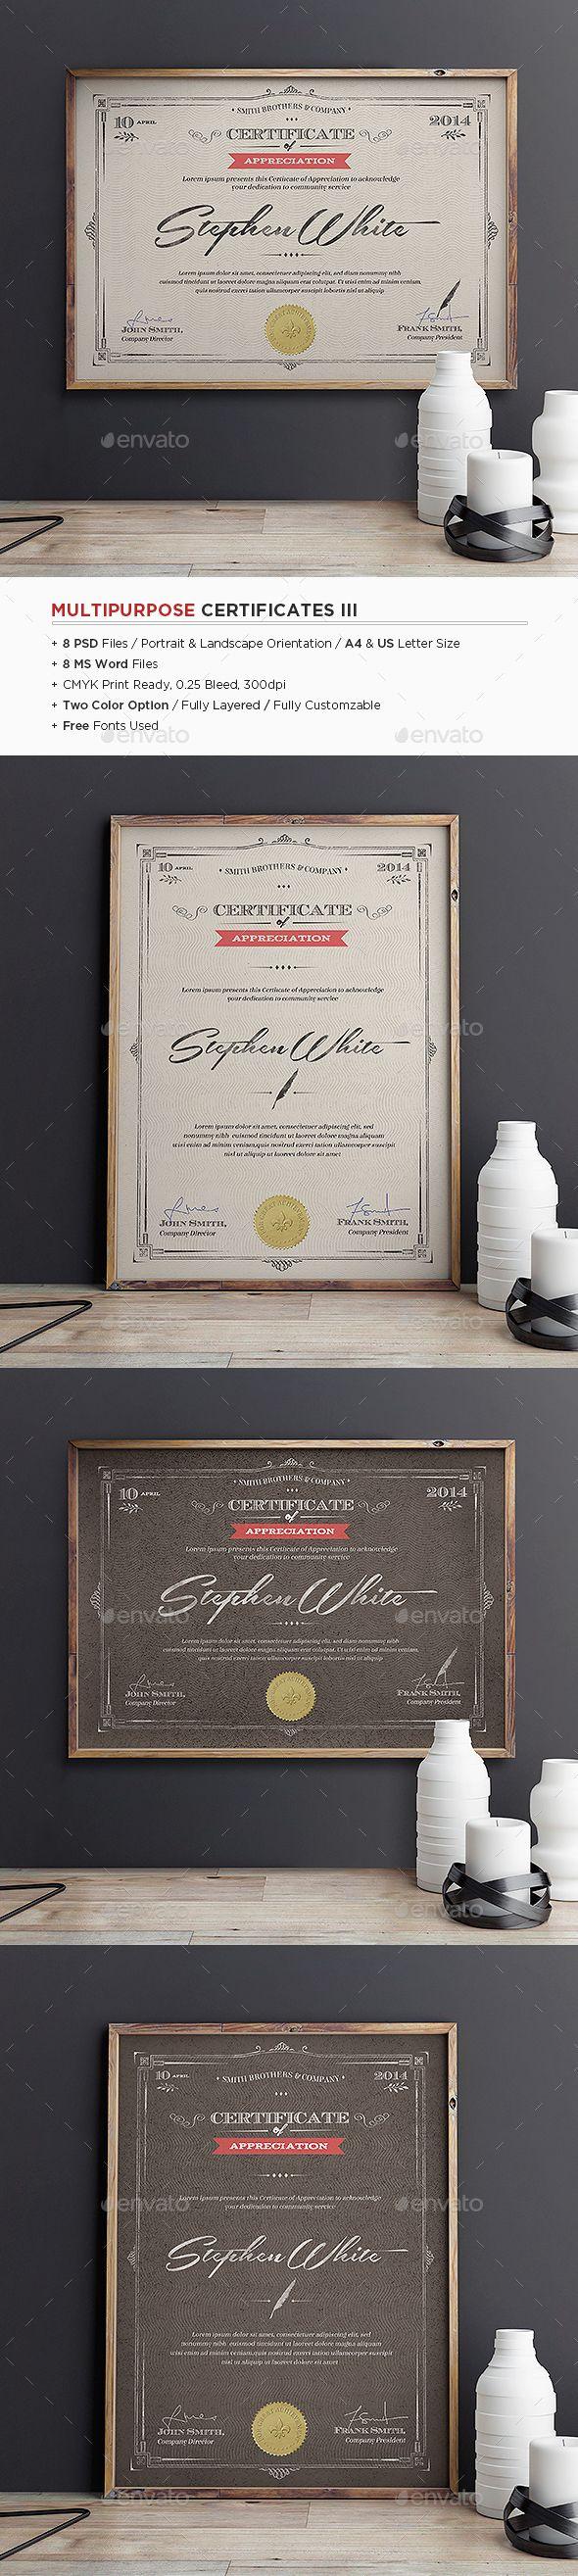 379 best Certificate Design images on Pinterest